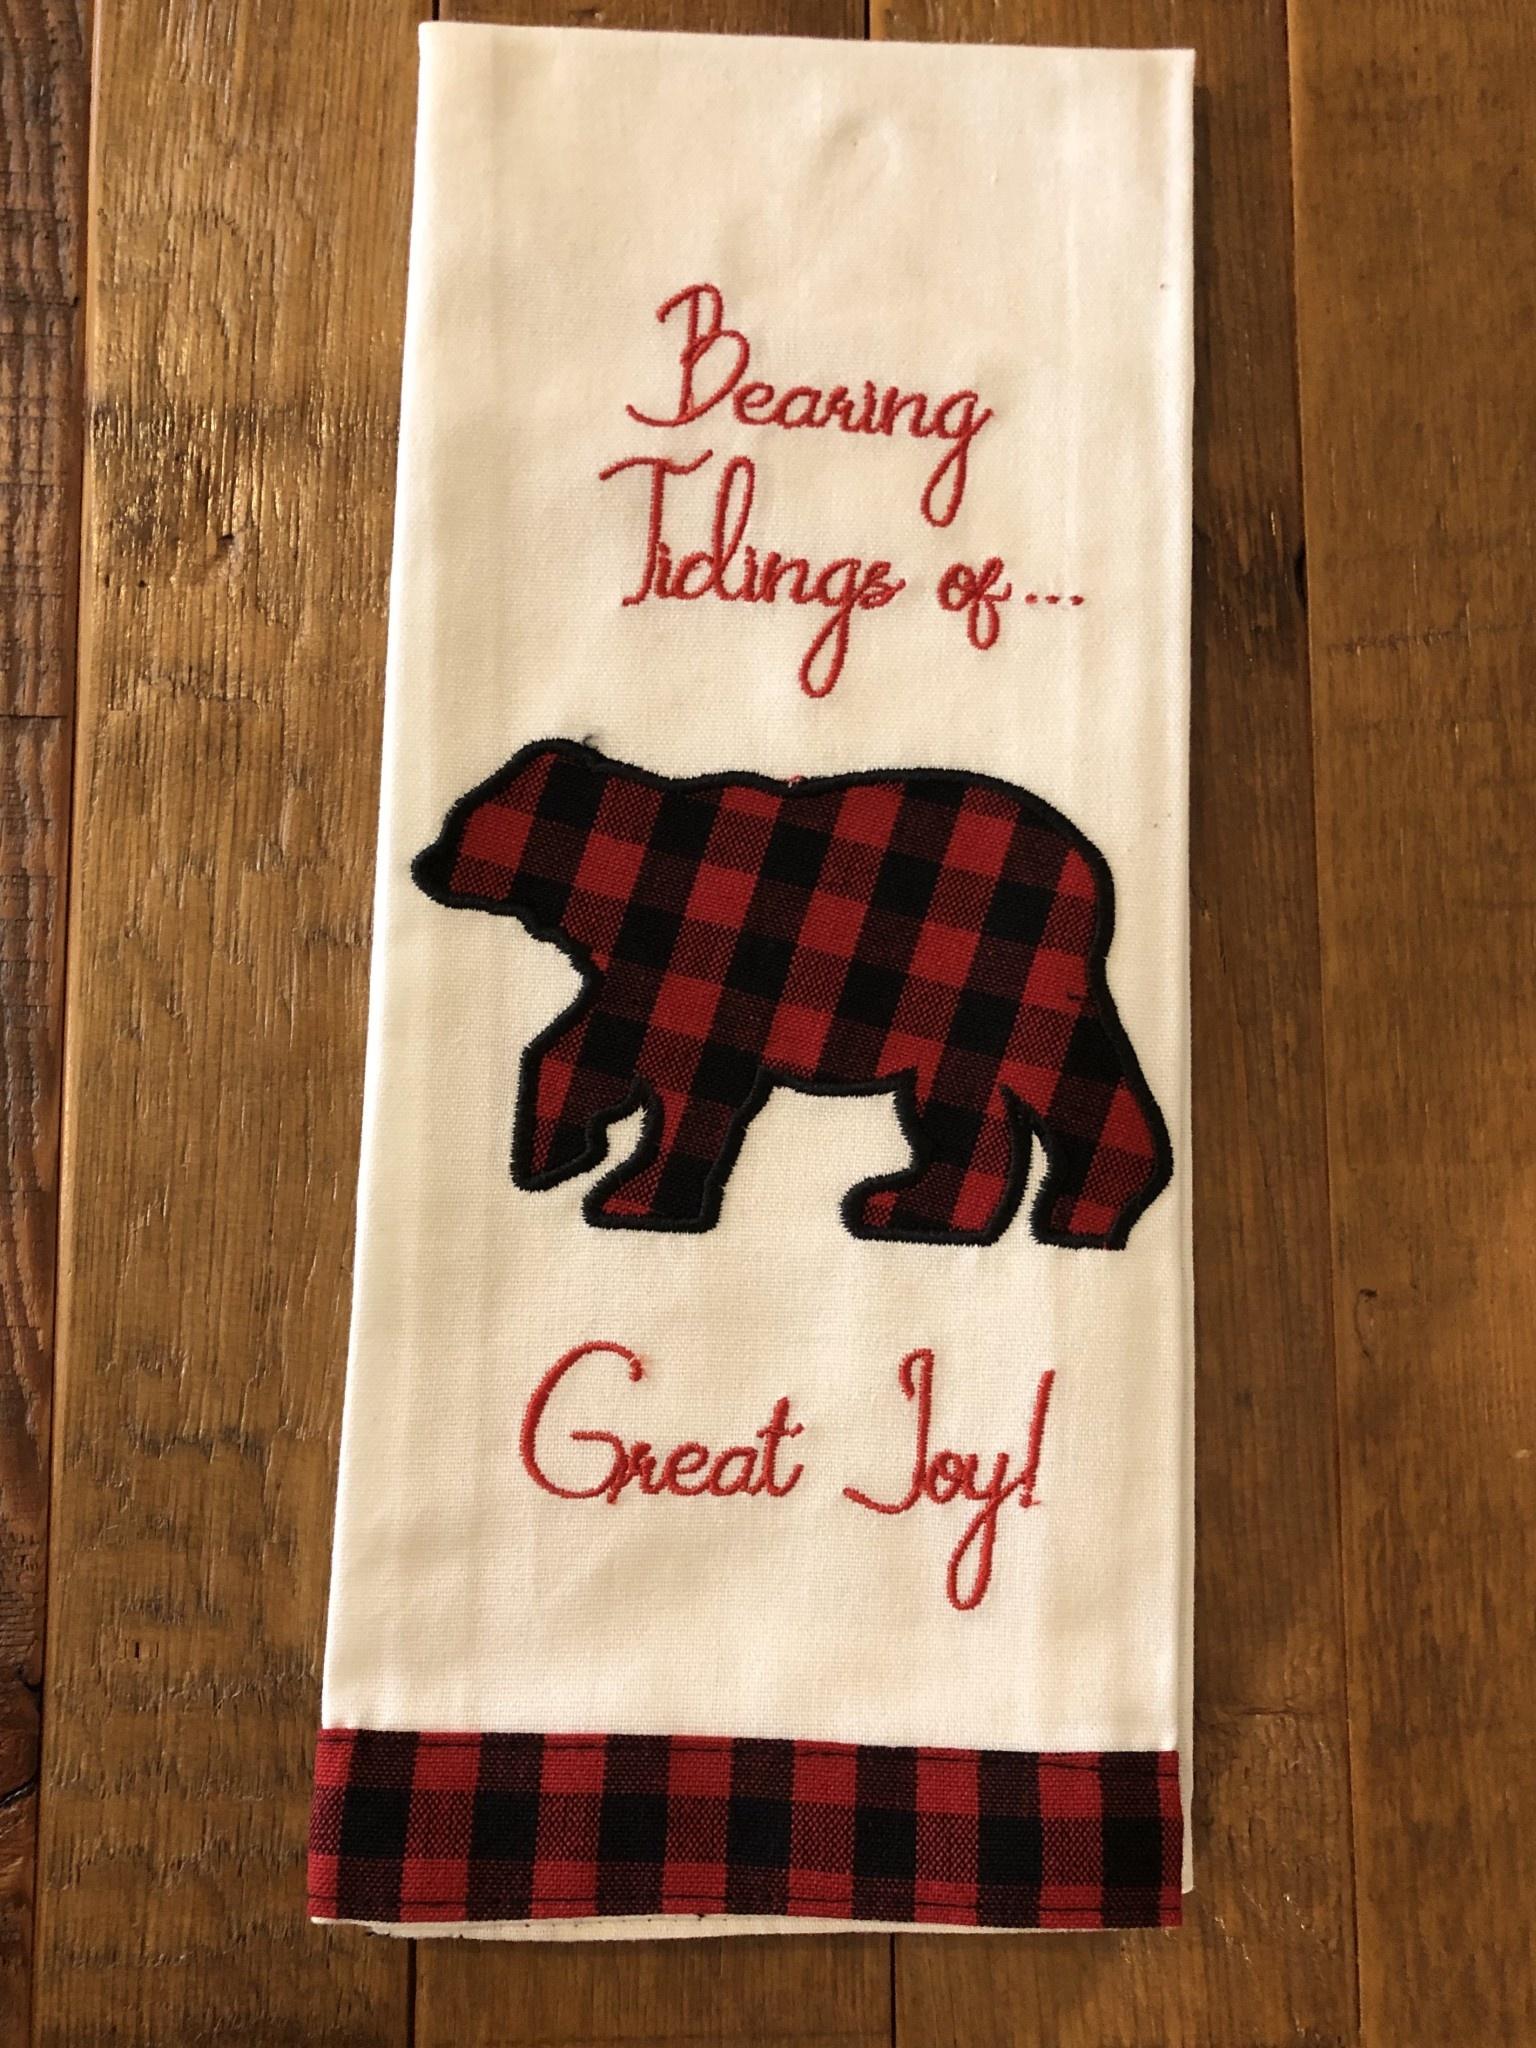 Park Design Tidings of Great Joy Towel